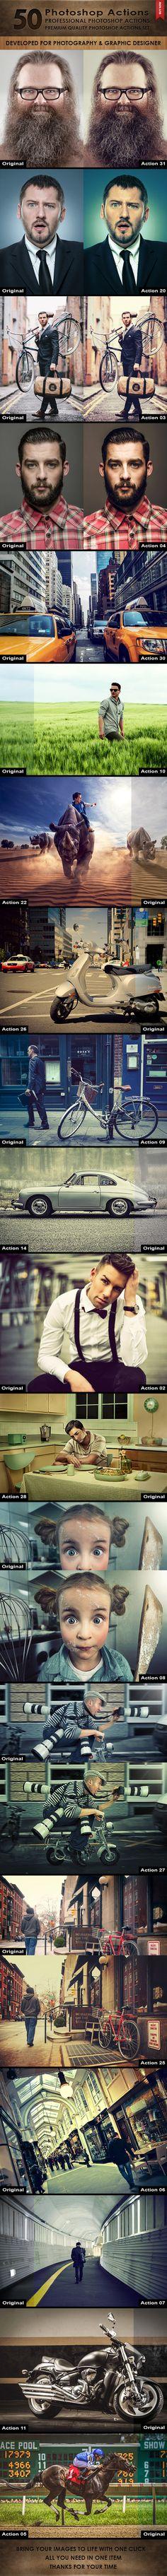 50 Photoshop Actions #design #photoeffect Download: http://graphicriver.net/item/50-photoshop-actions/10481310?ref=ksioks